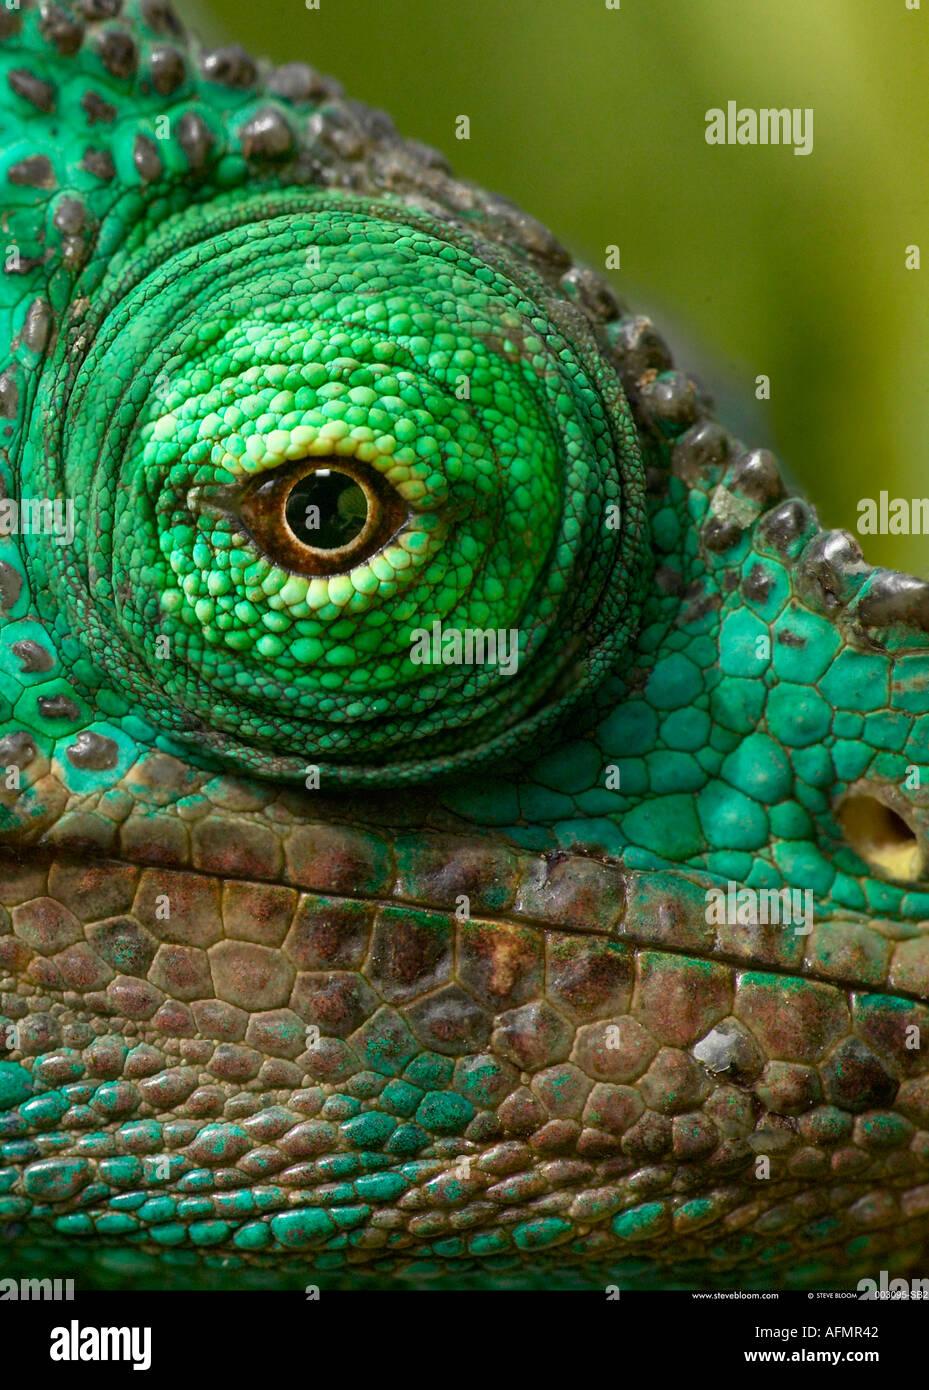 Nahaufnahme des Auges ein Parson s Chamäleon Perinet-Madagaskar Stockbild